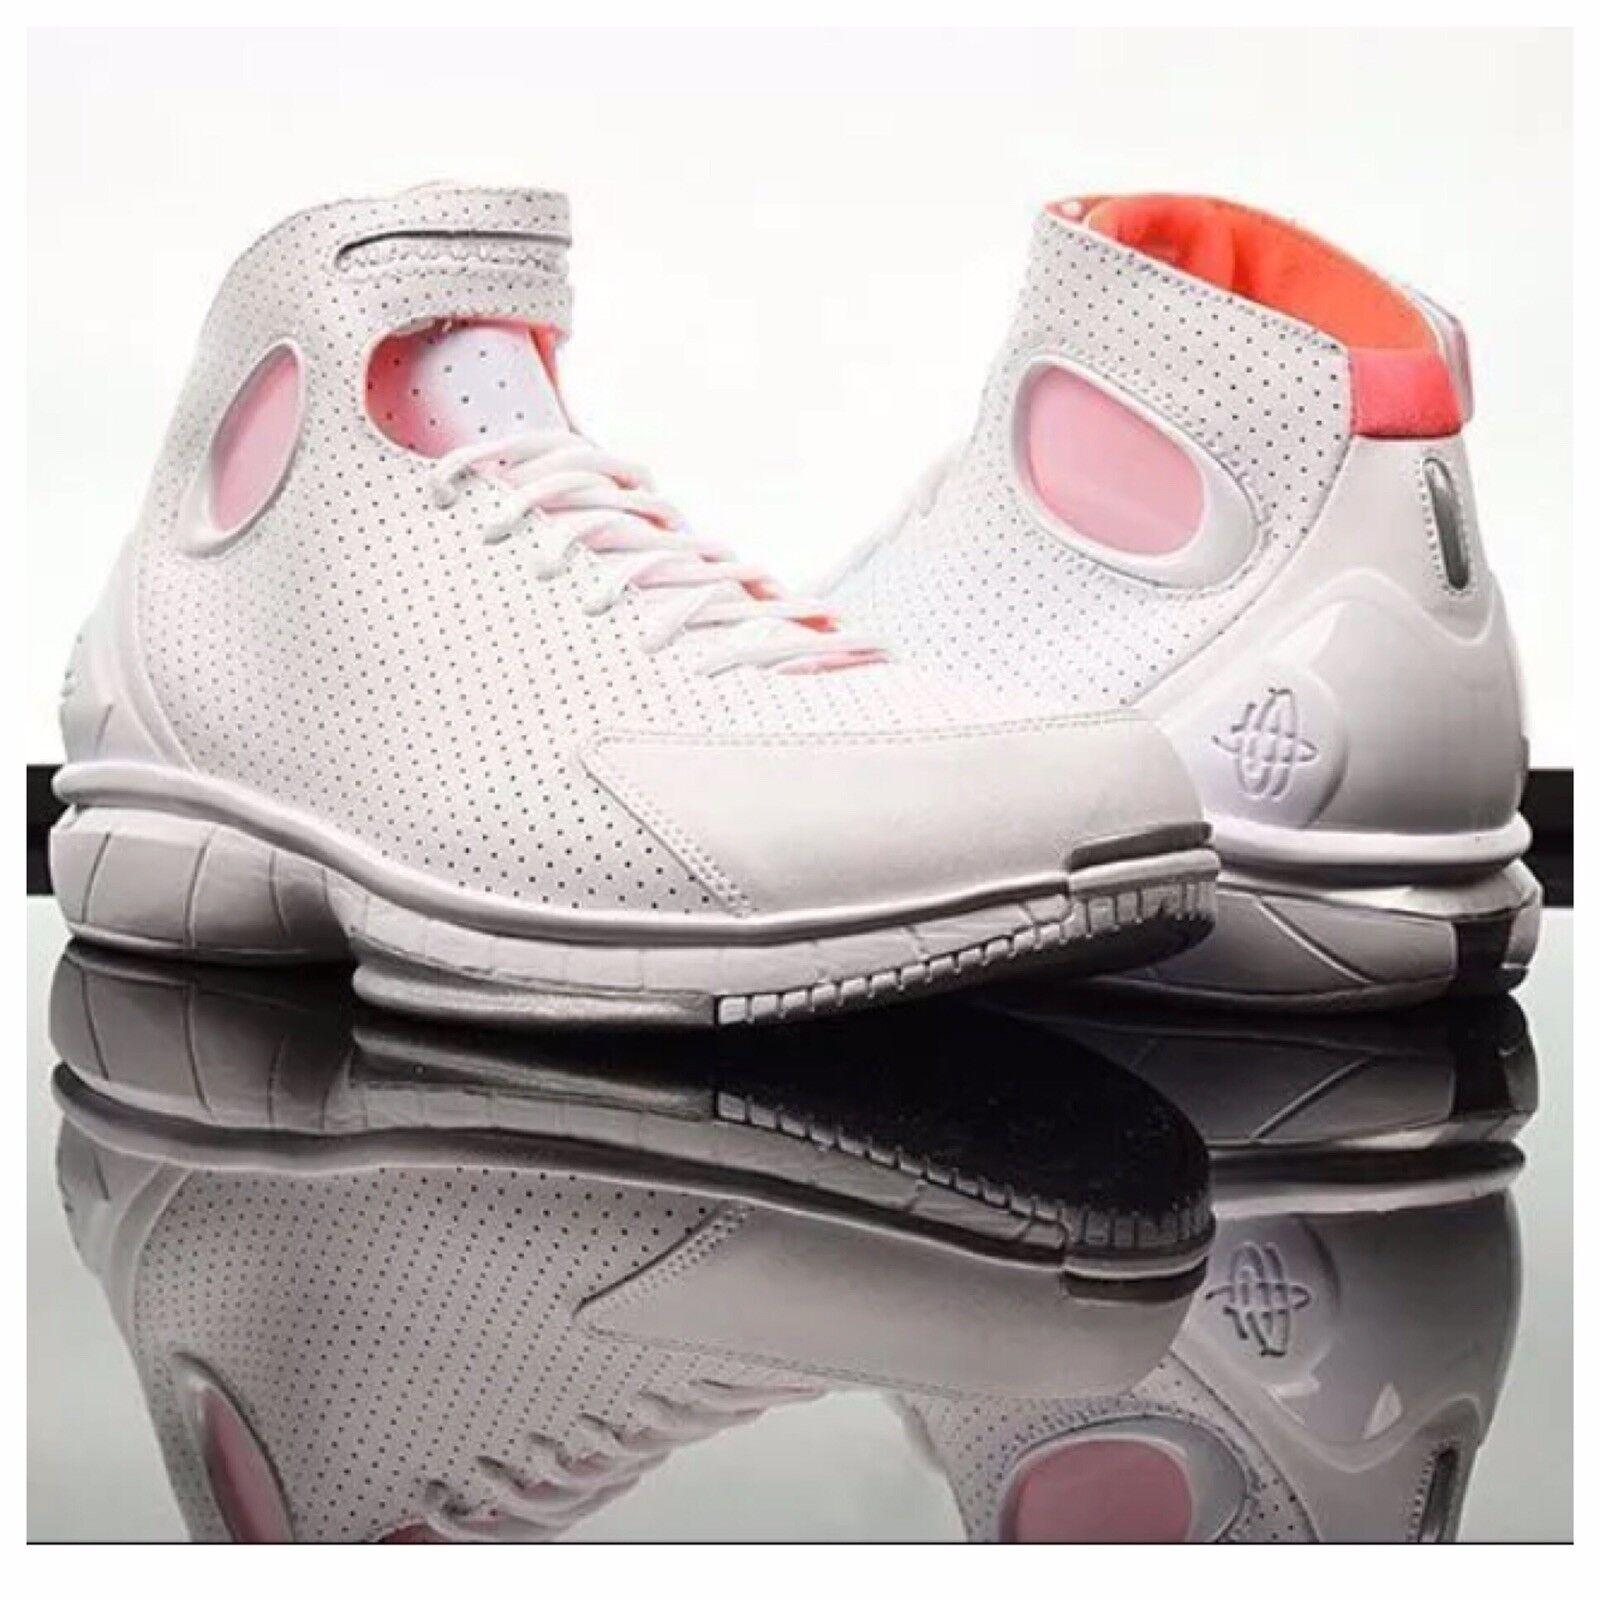 Nike Air Air Nike Zoom Huarache 2K4 Kobe Men's Basketball Shoes 308475-102 Size 10 Rare 7157ea